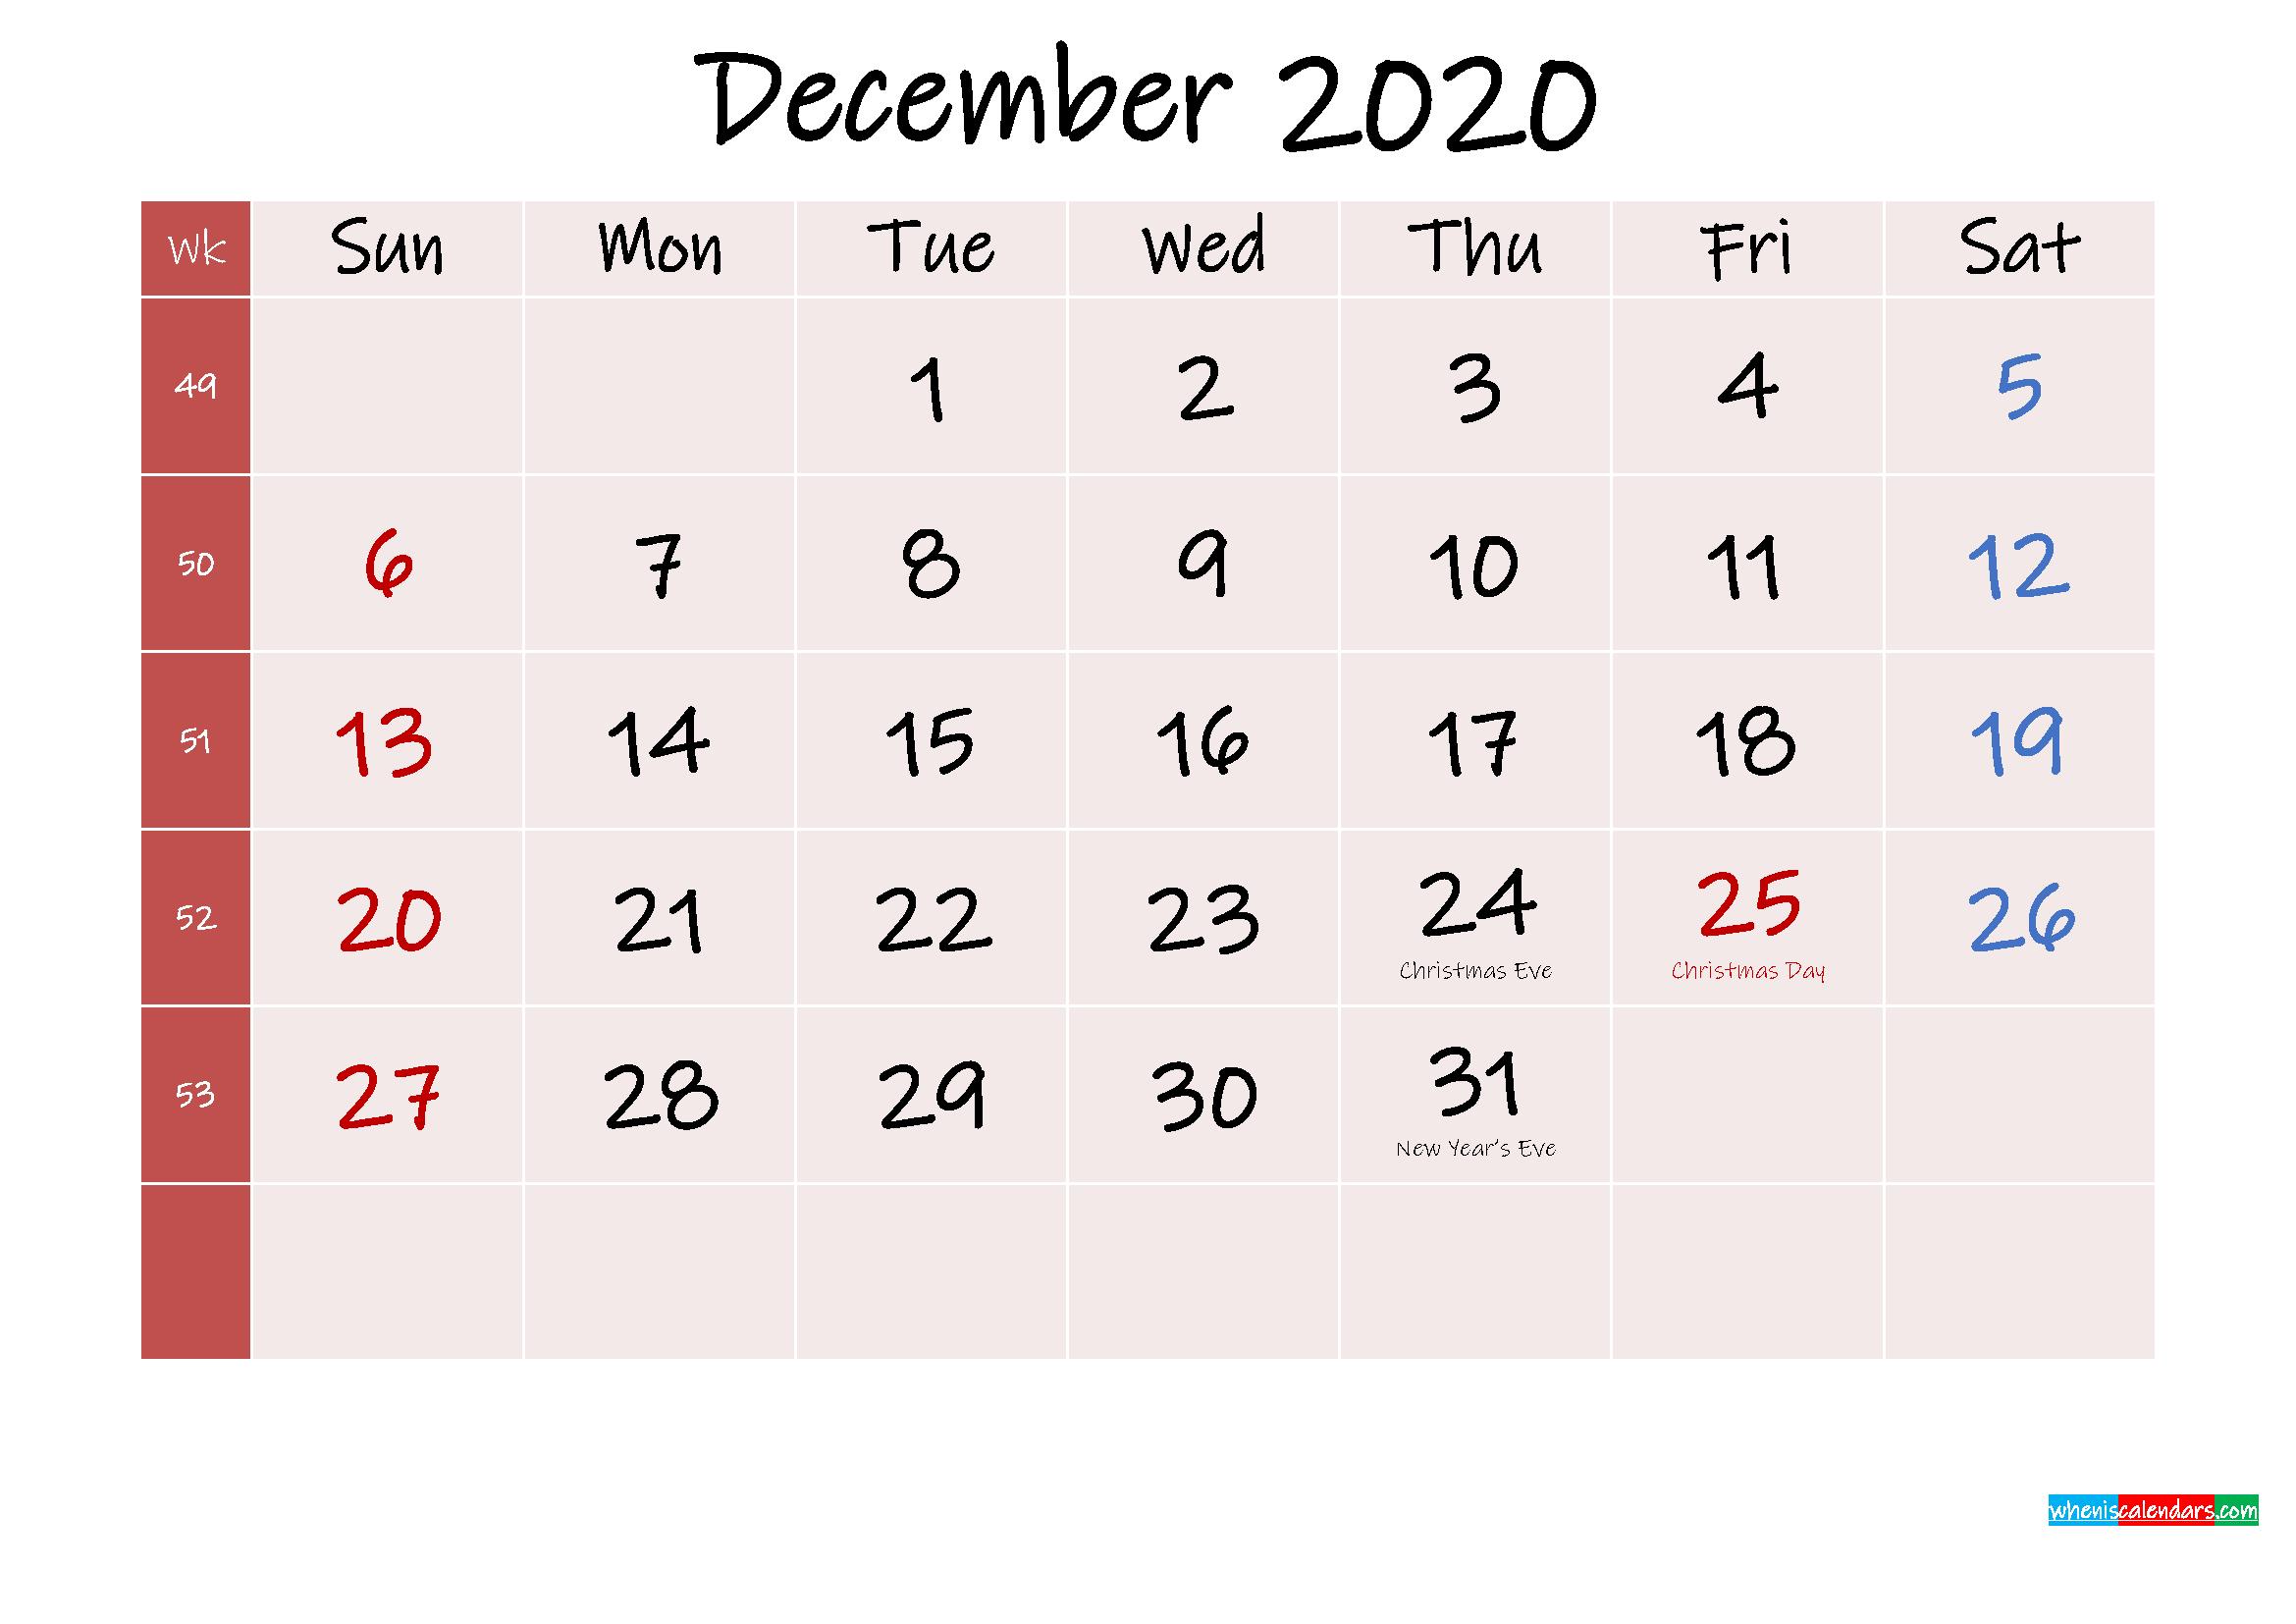 Free Printable December 2020 Calendar with Holidays